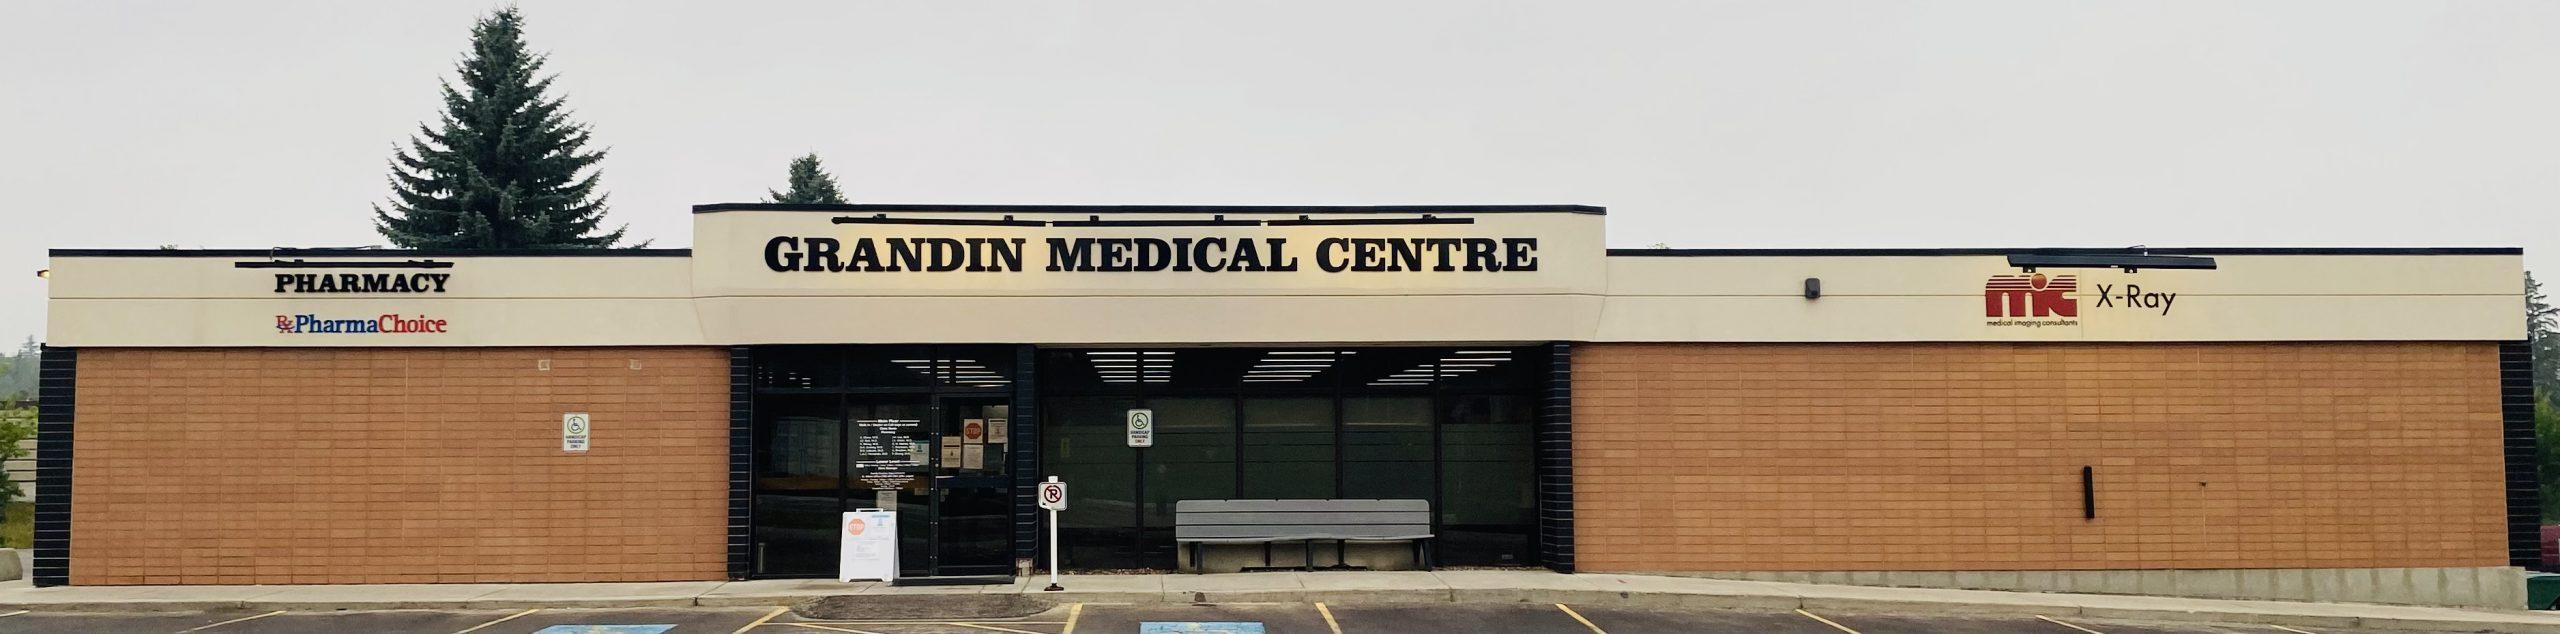 Grandin Medical Centre